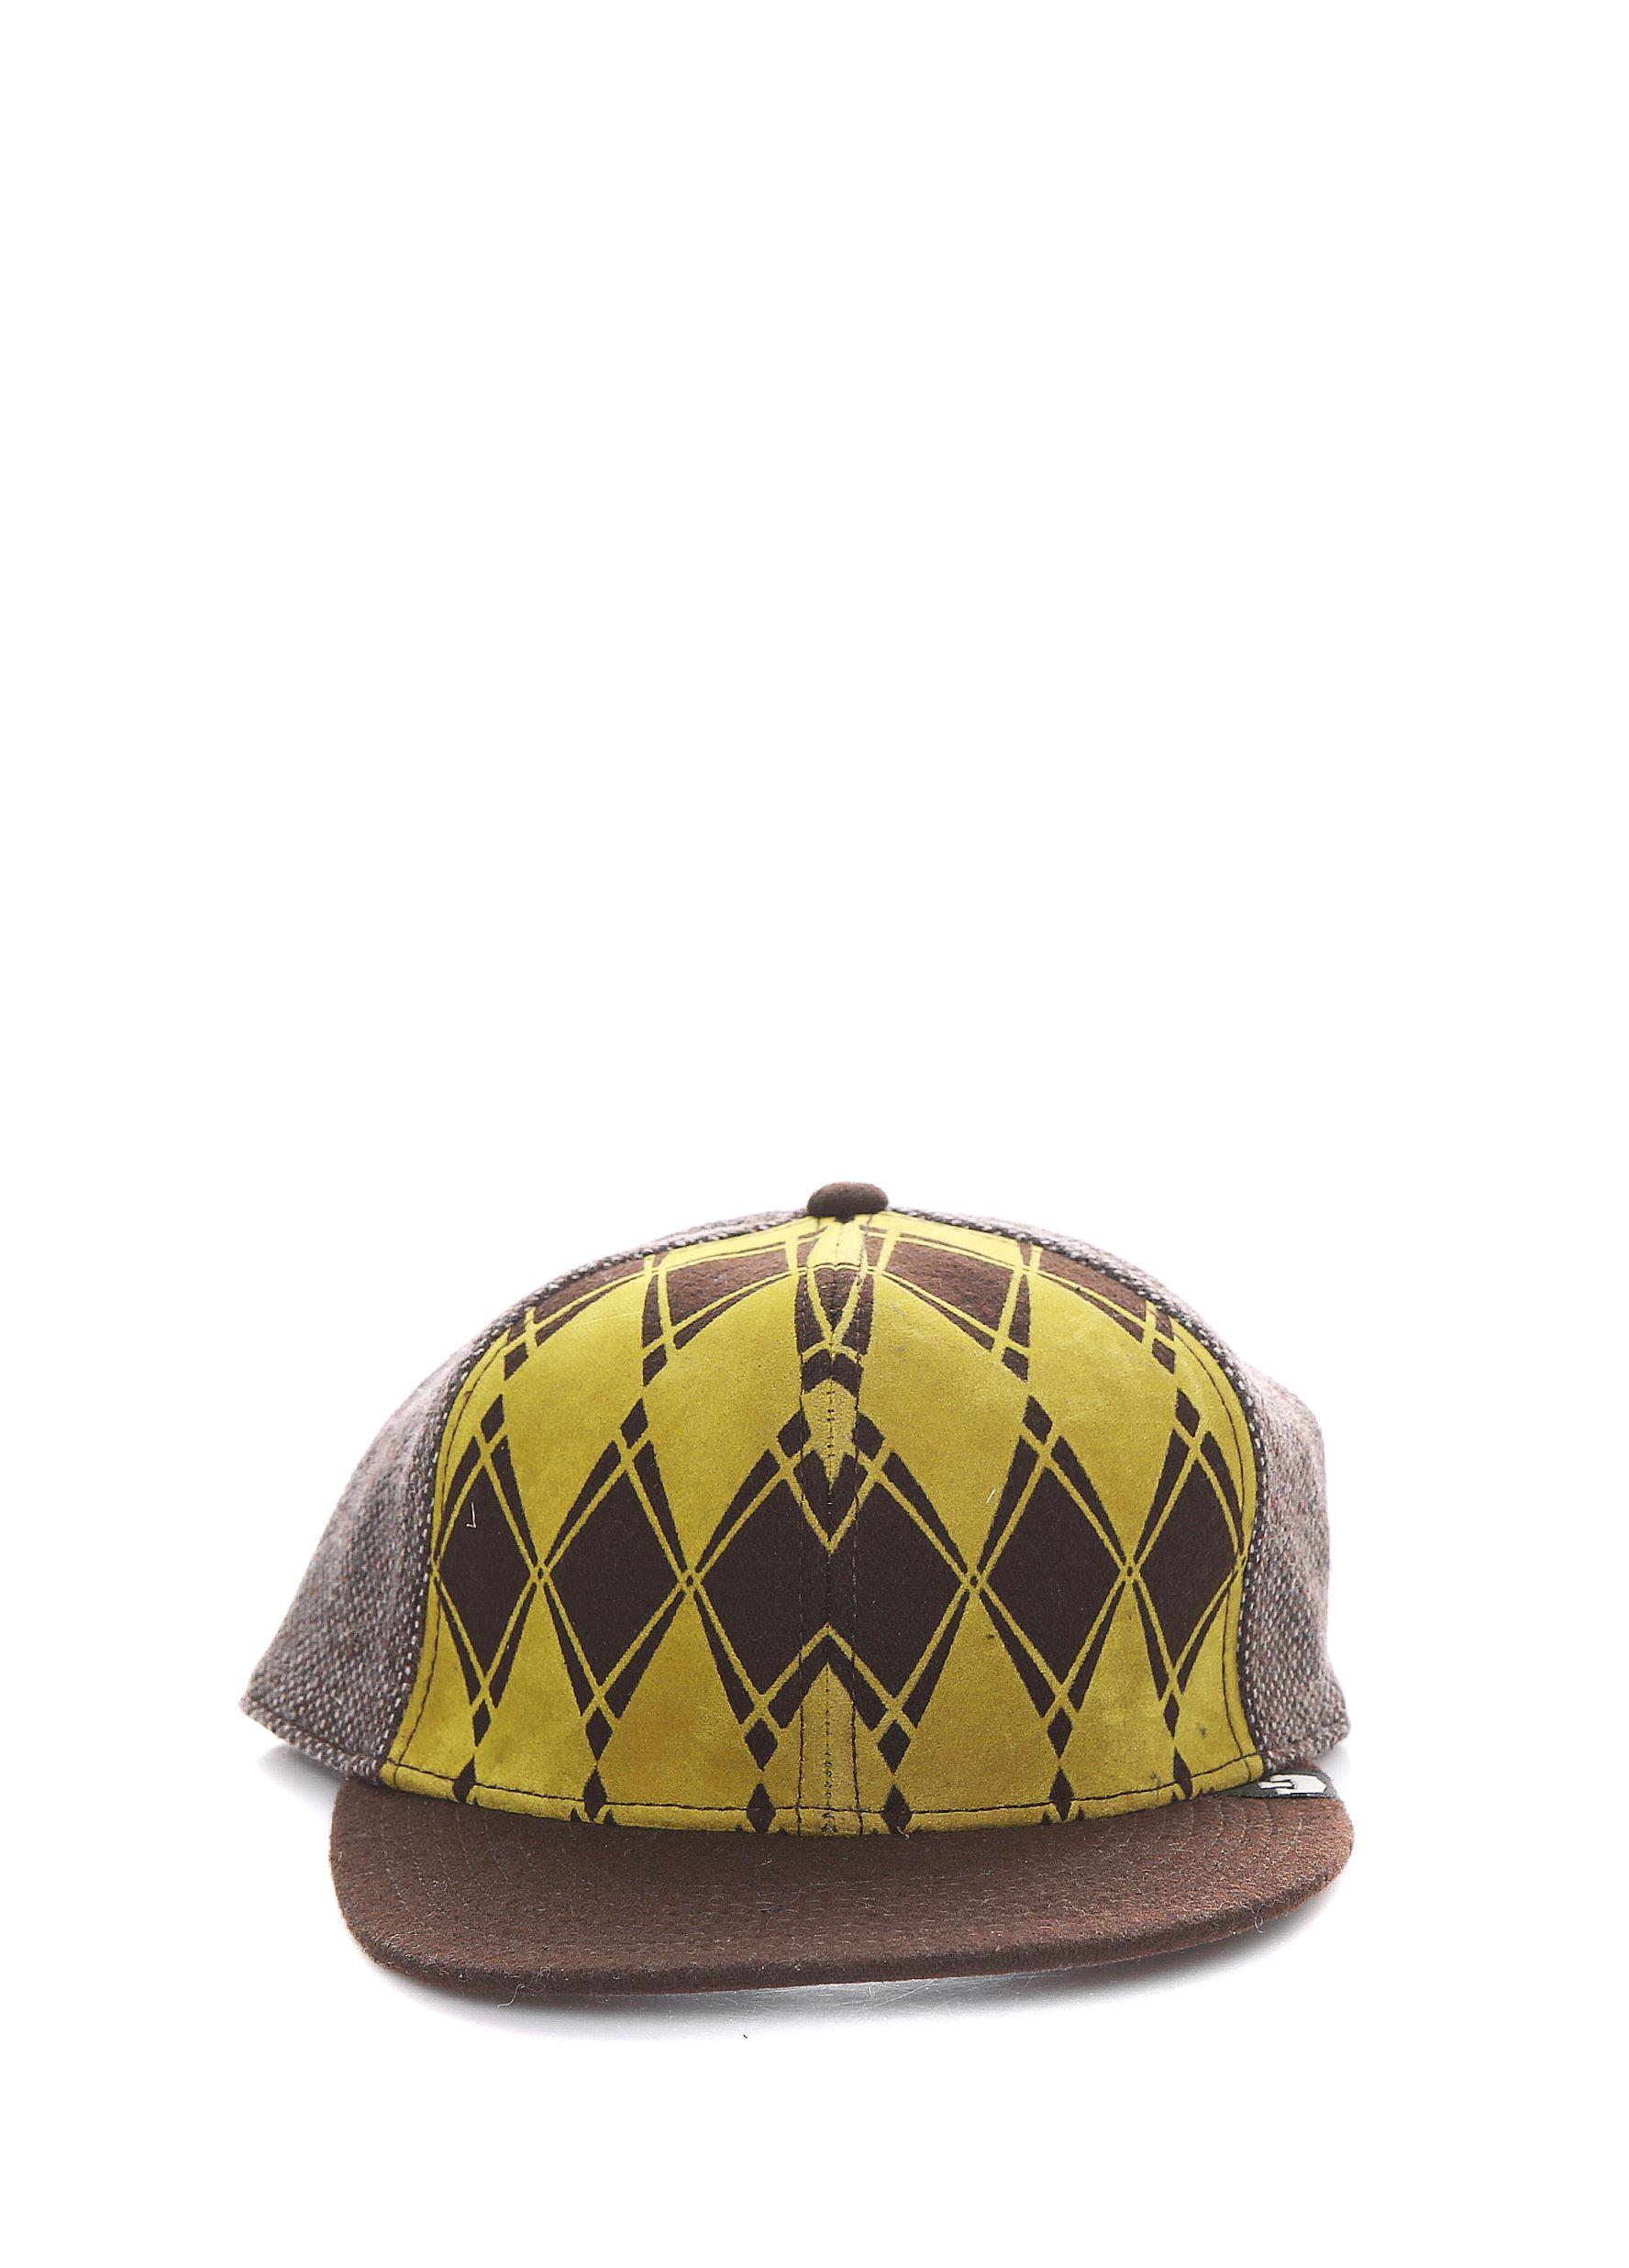 Man Code - Ανδρικό Καπέλο GOORIN BROTHERS